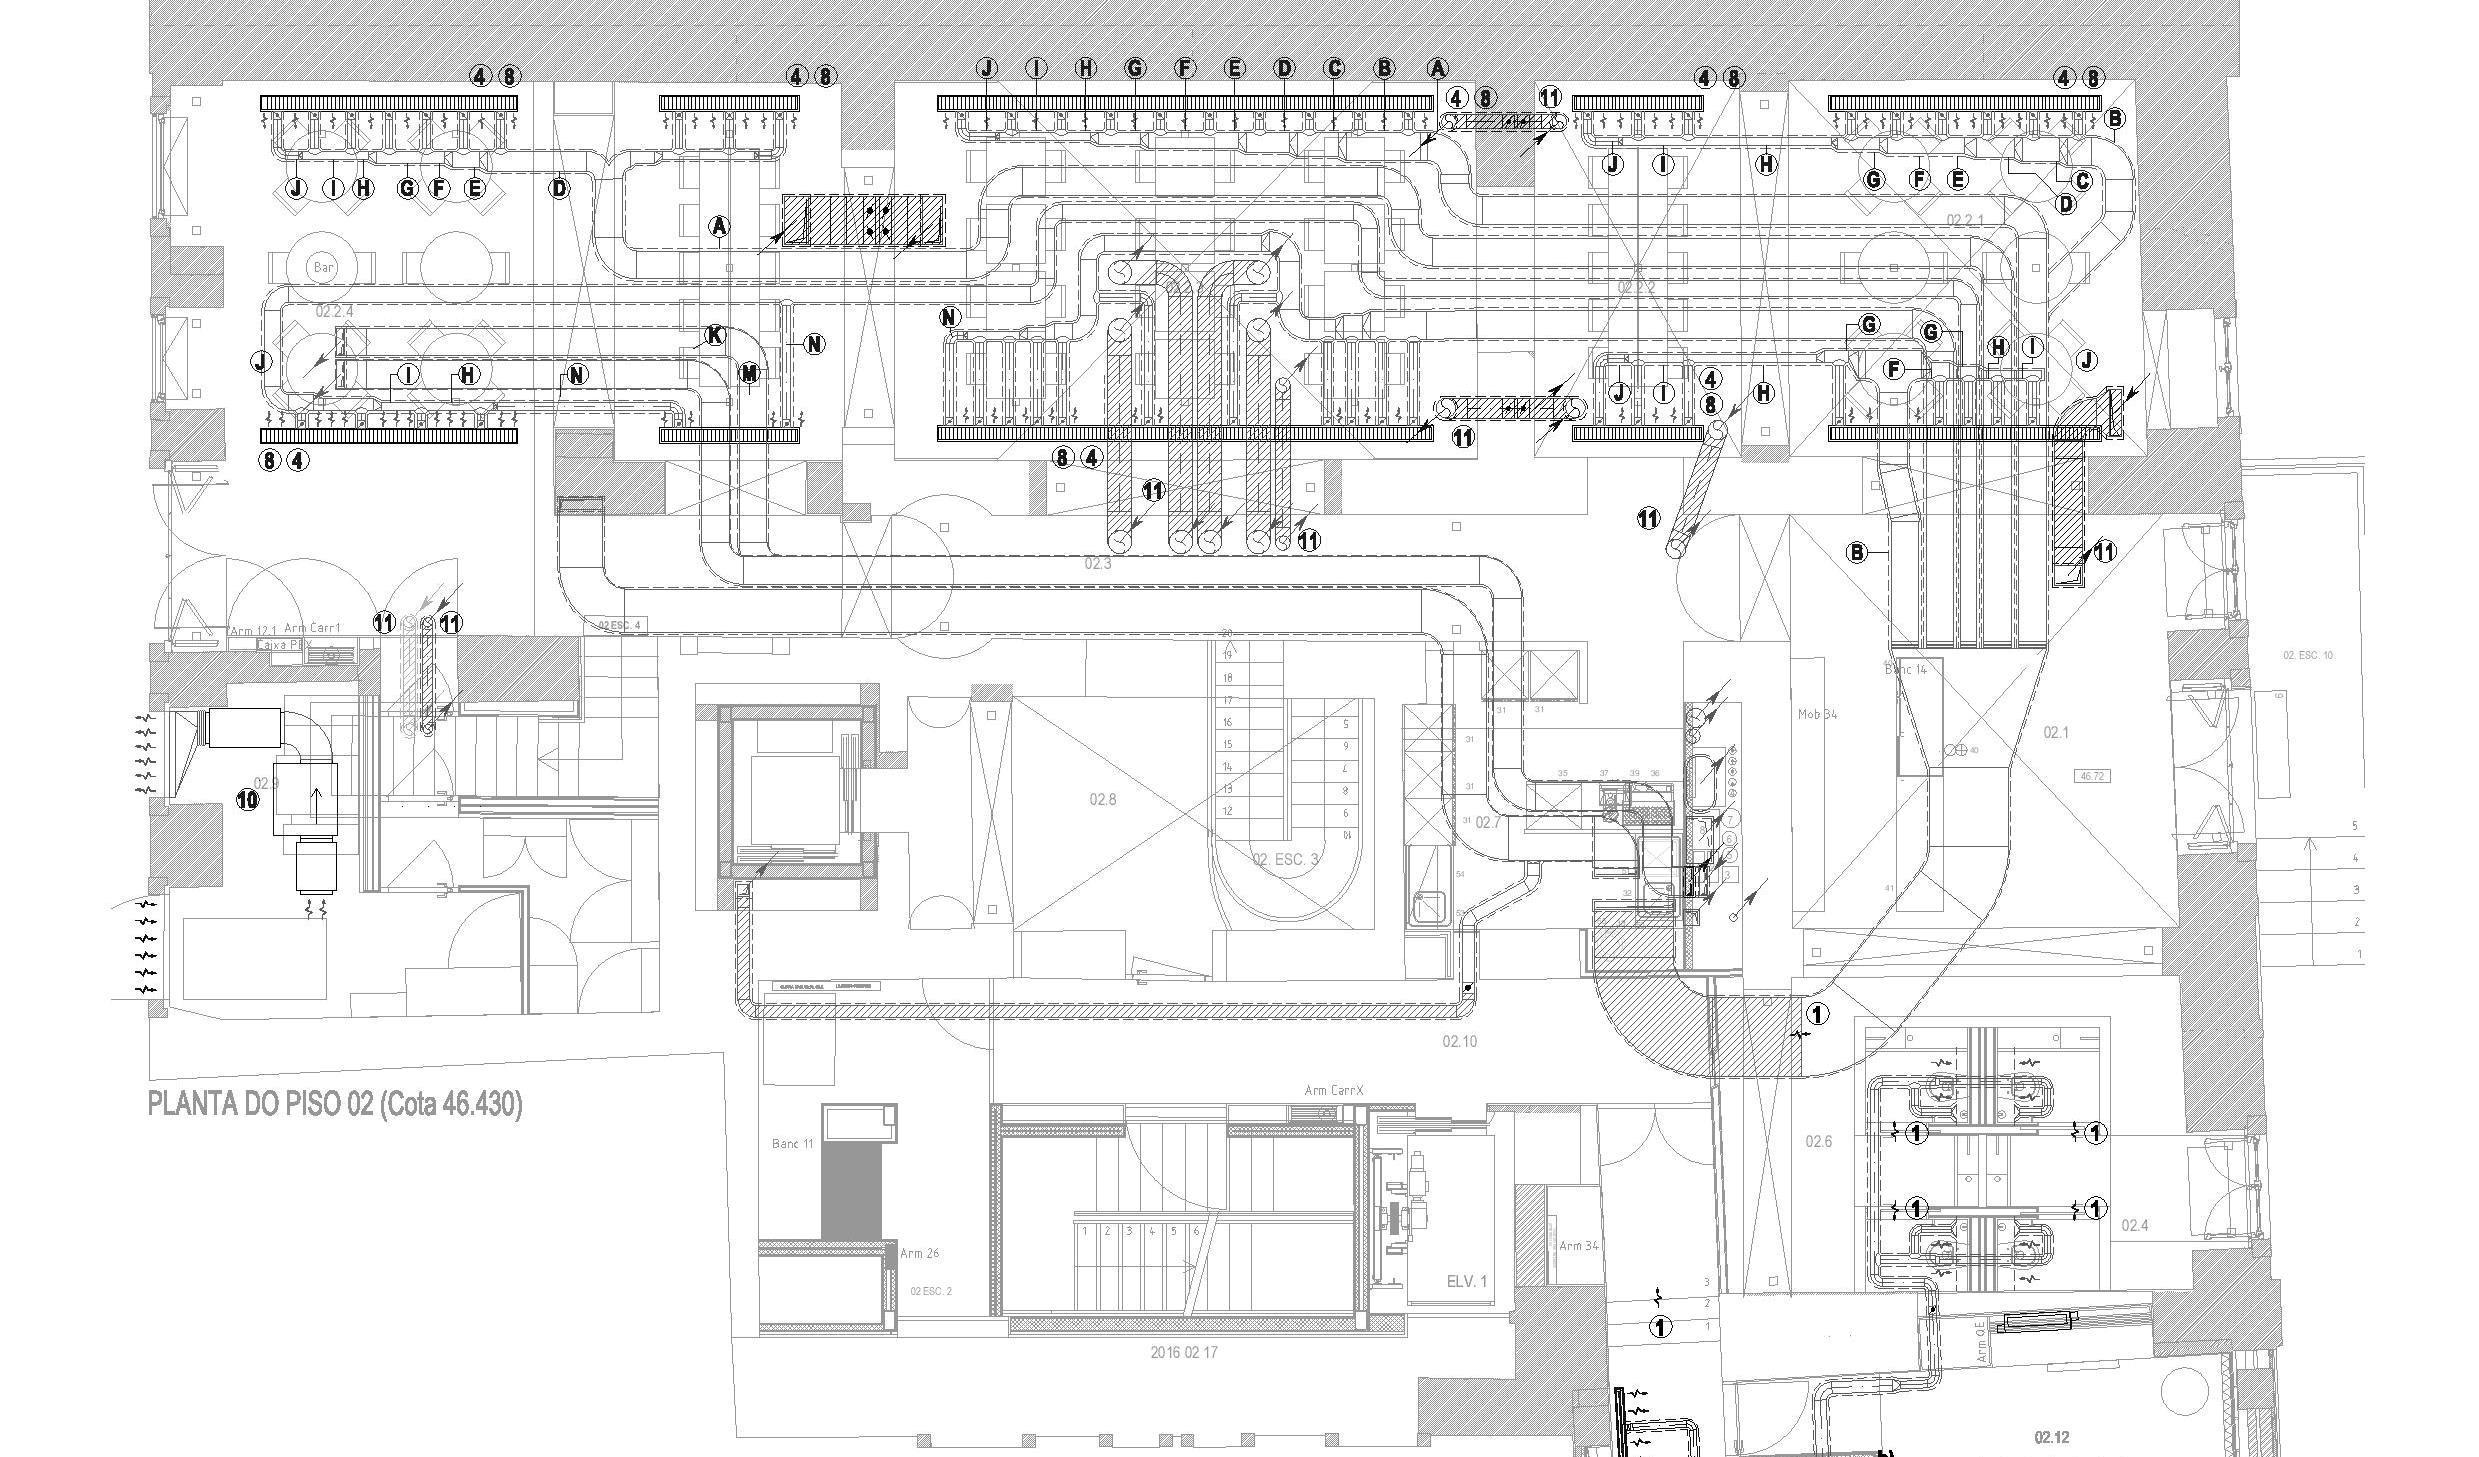 Planta AVAC piso 02-page-001.jpg